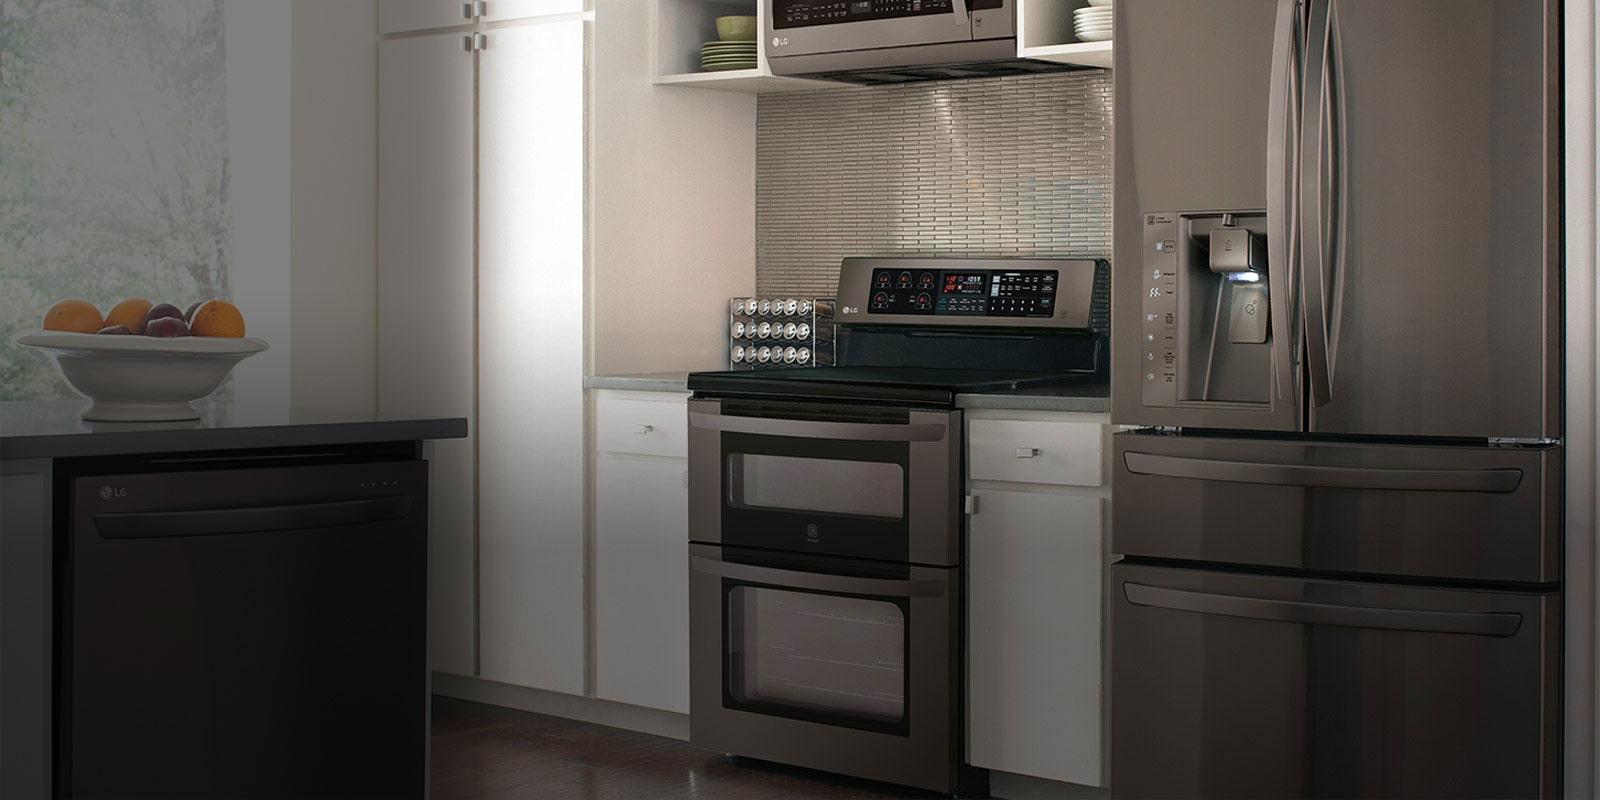 Lg Microwave Ovens